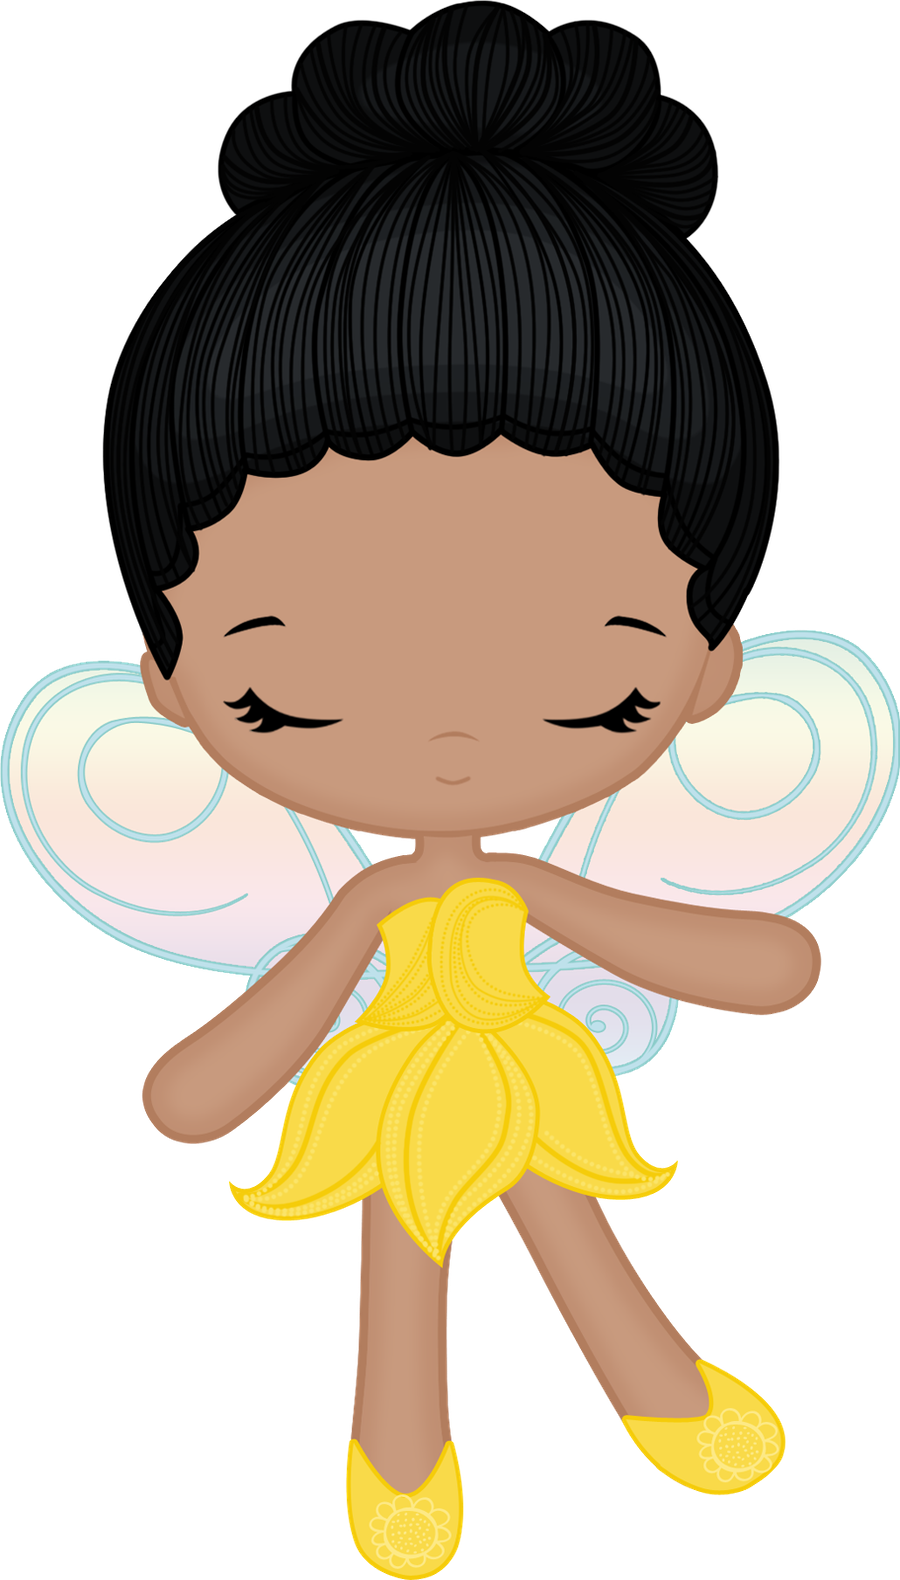 Tinkerbell clipart fairy chinese. Princesas e pr ncipes